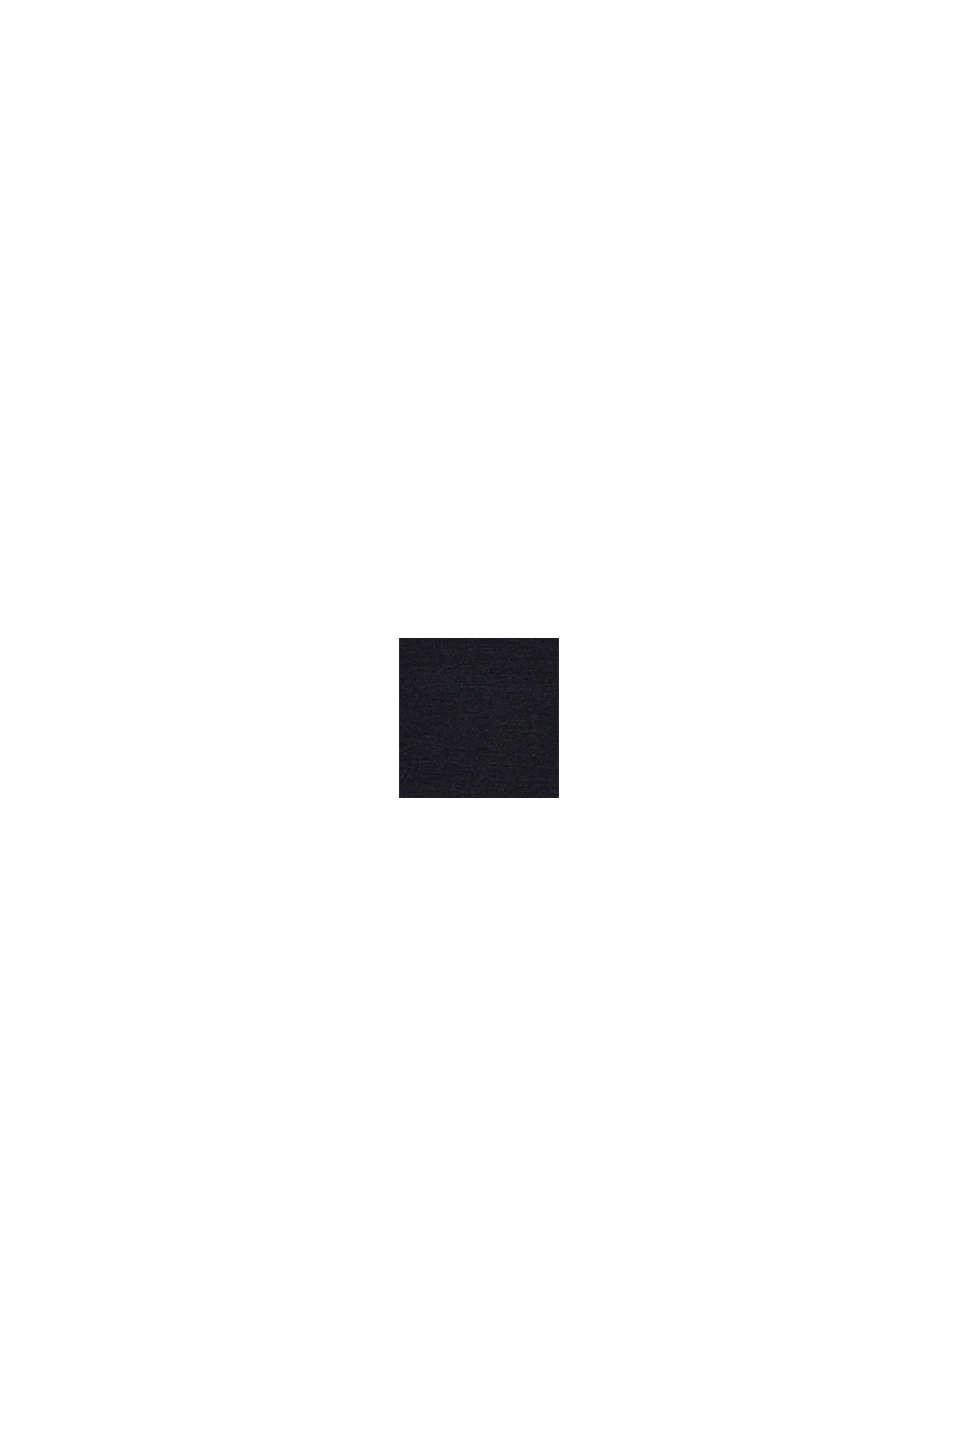 Slips taille basse à taille en dentelle, lot de 2, BLACK, swatch